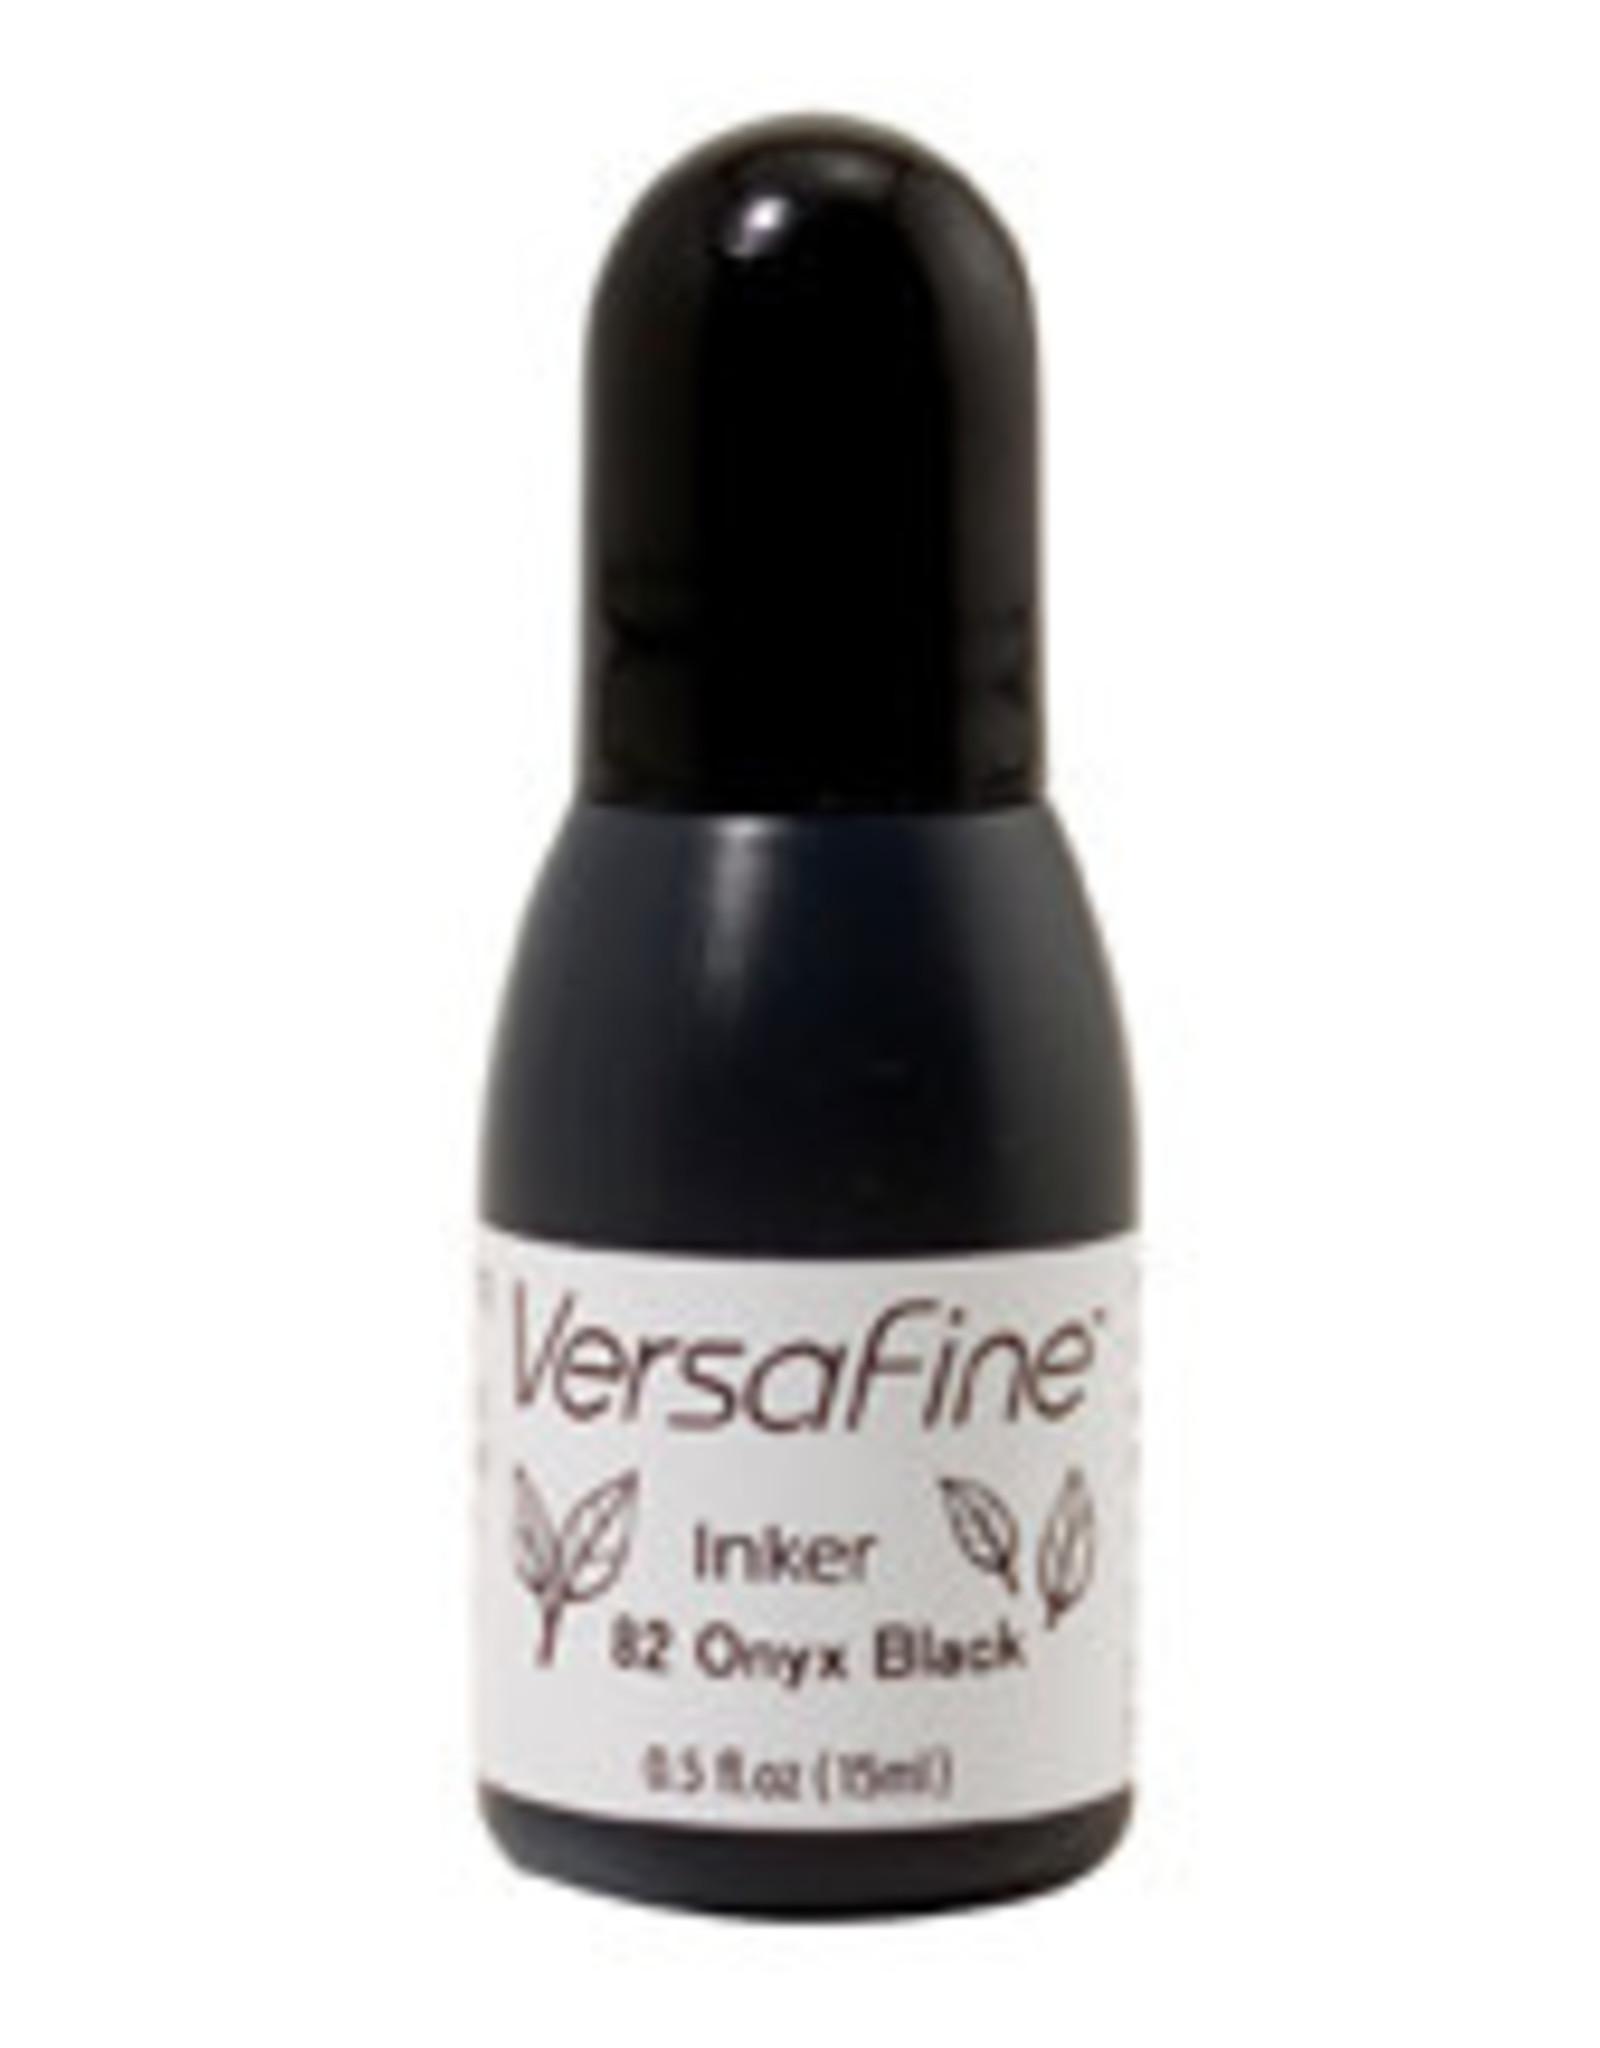 VersaFine Inker - Onyx Black